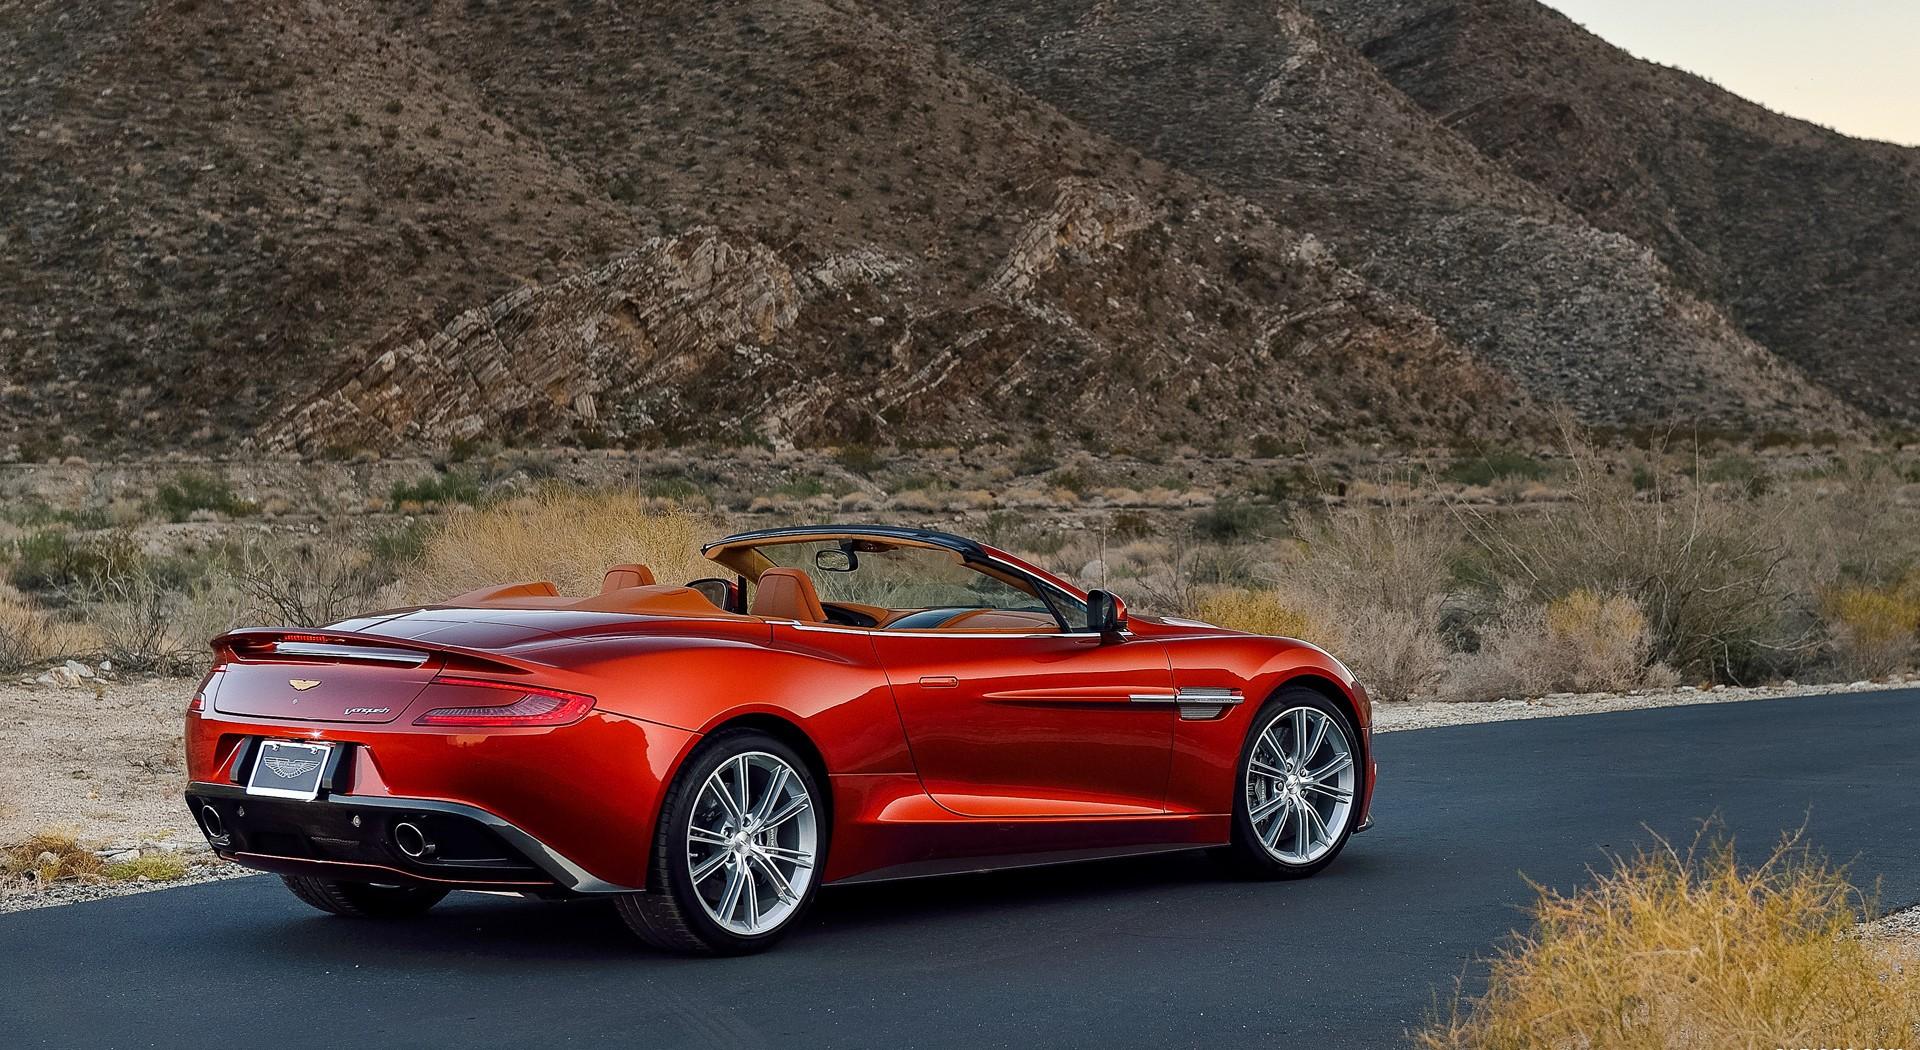 Aston Martin Vanquish Wallpapers red